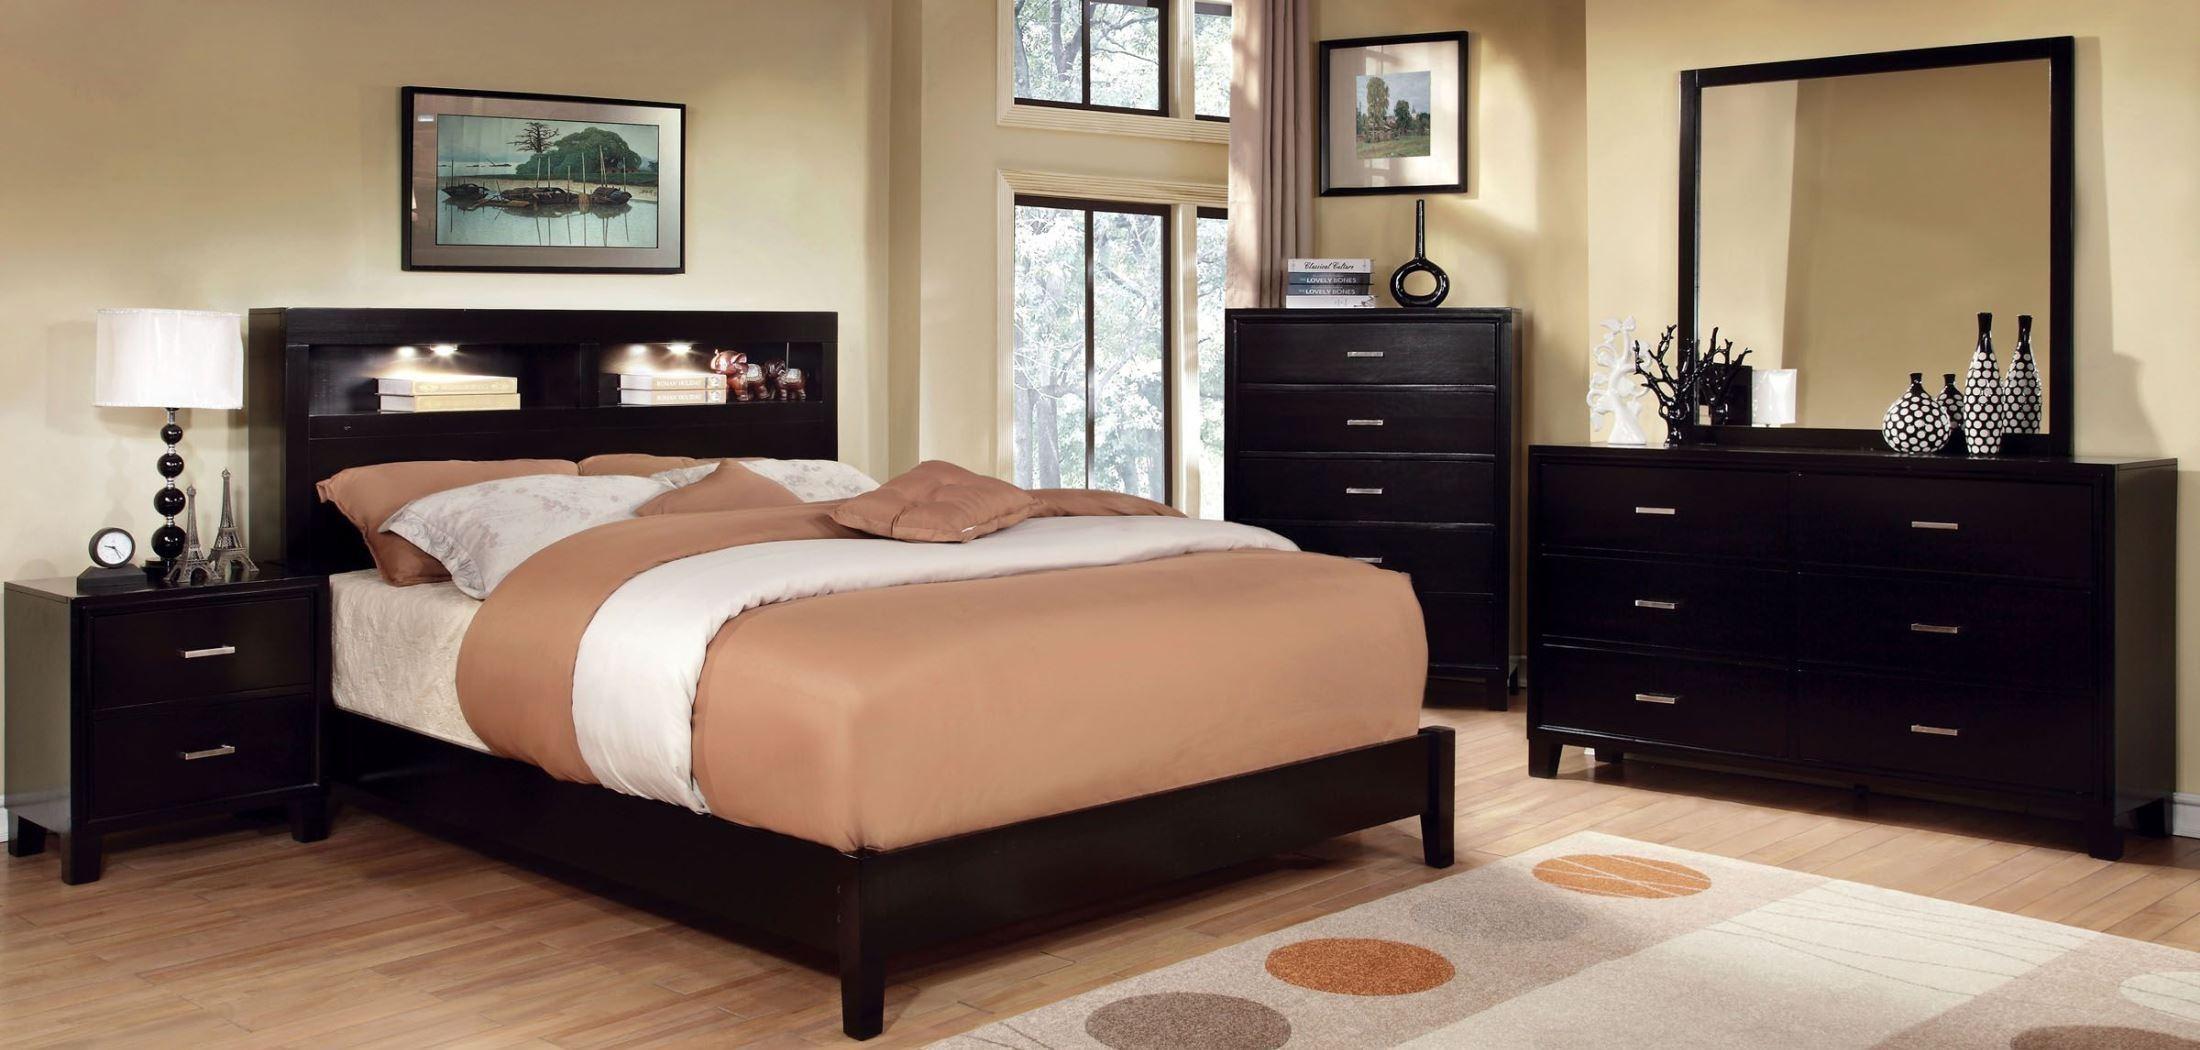 Gerico I Dark Espresso Bedroom Set From Furniture Of